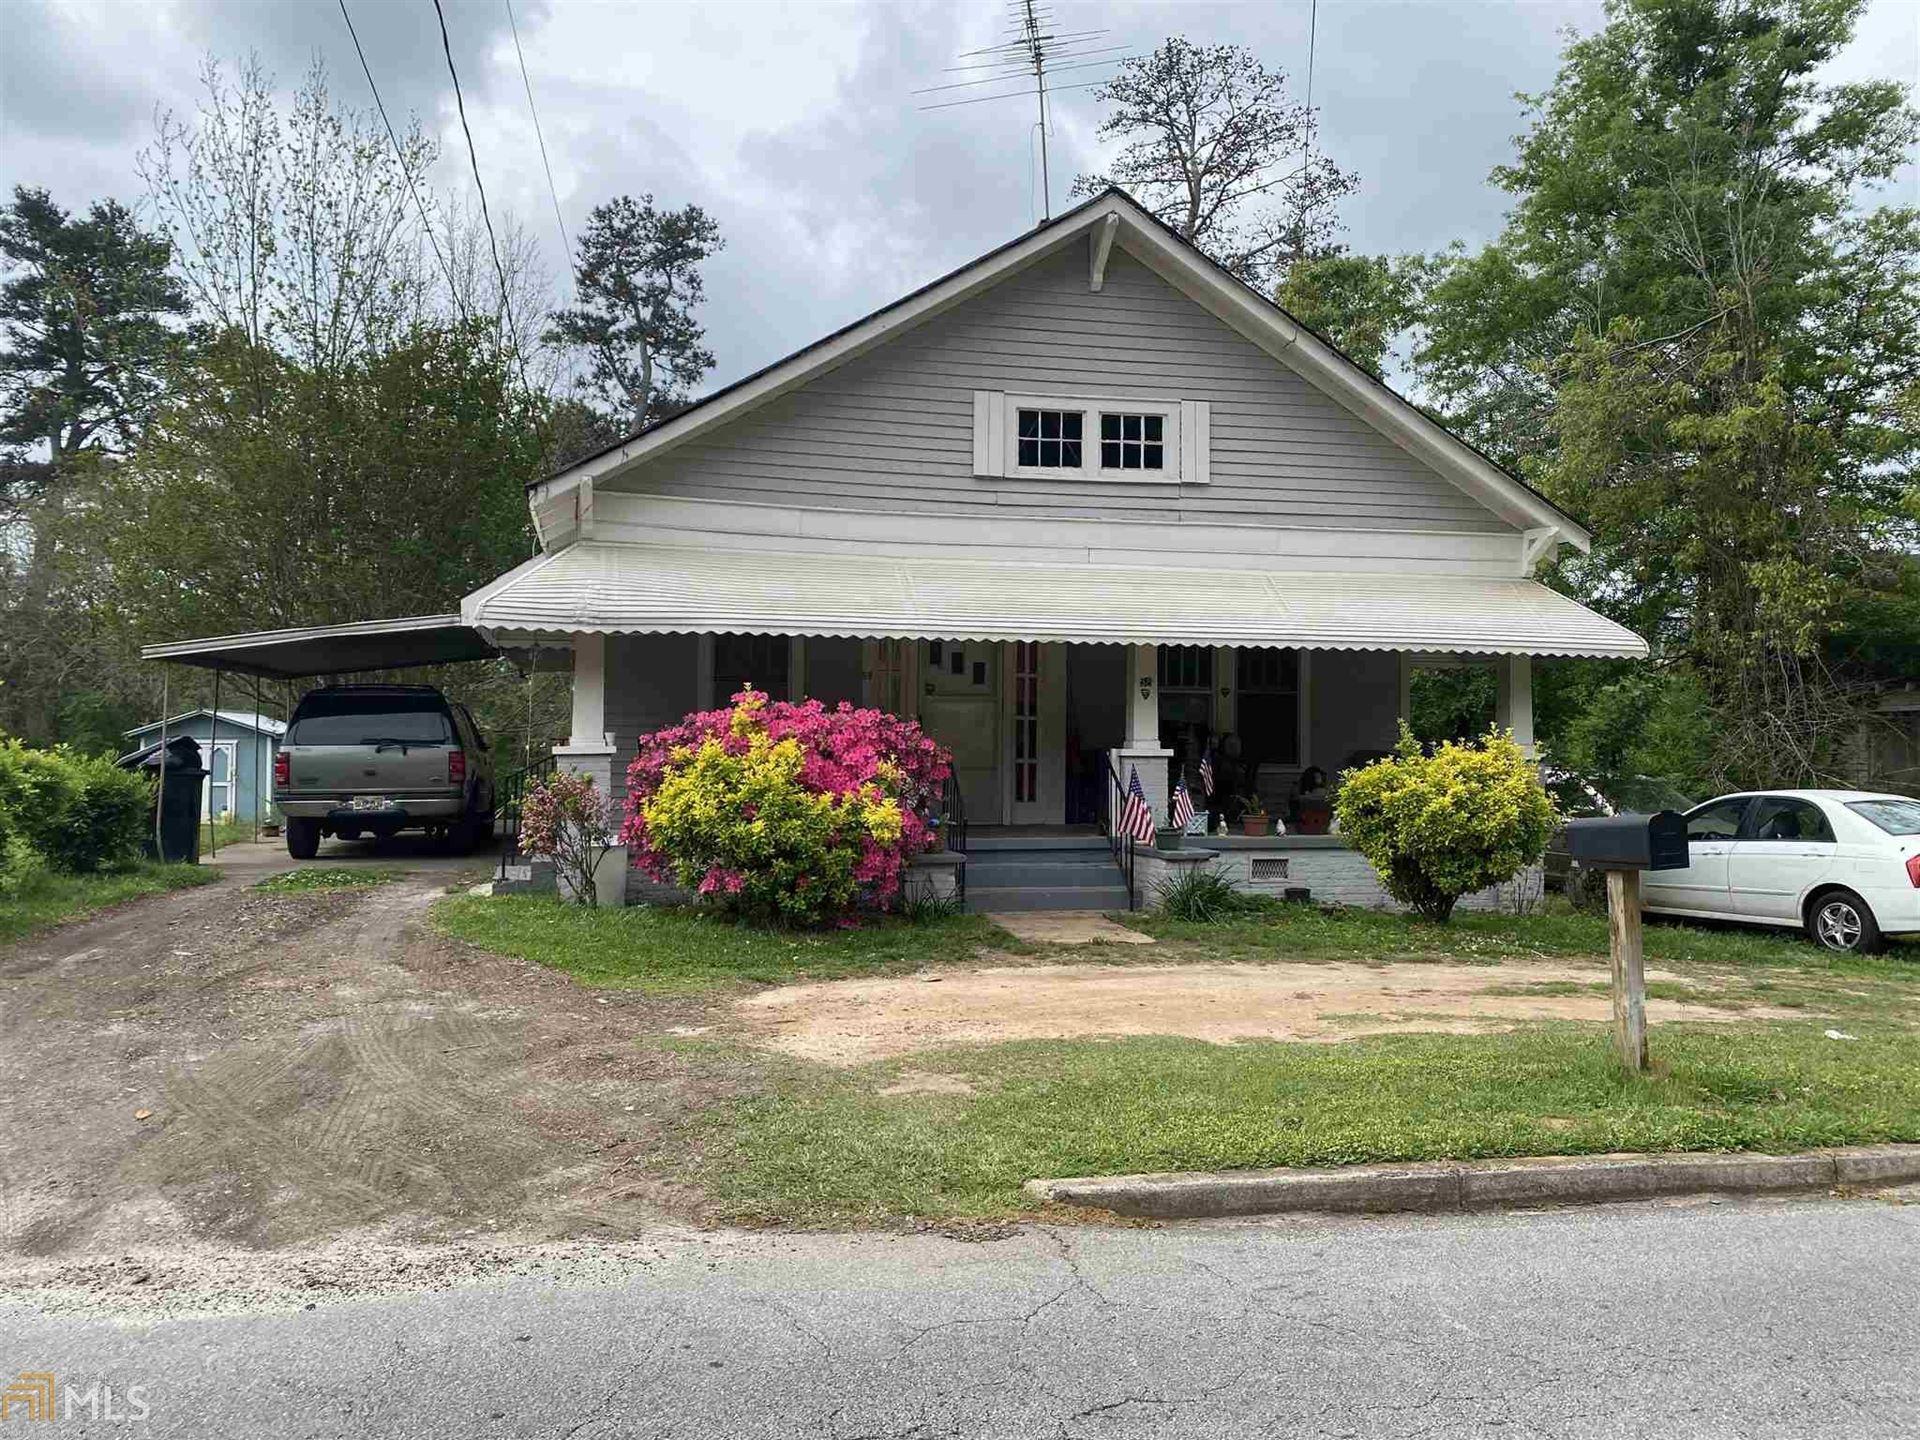 58 Bleachery St, Griffin, GA 30223 - #: 8975083